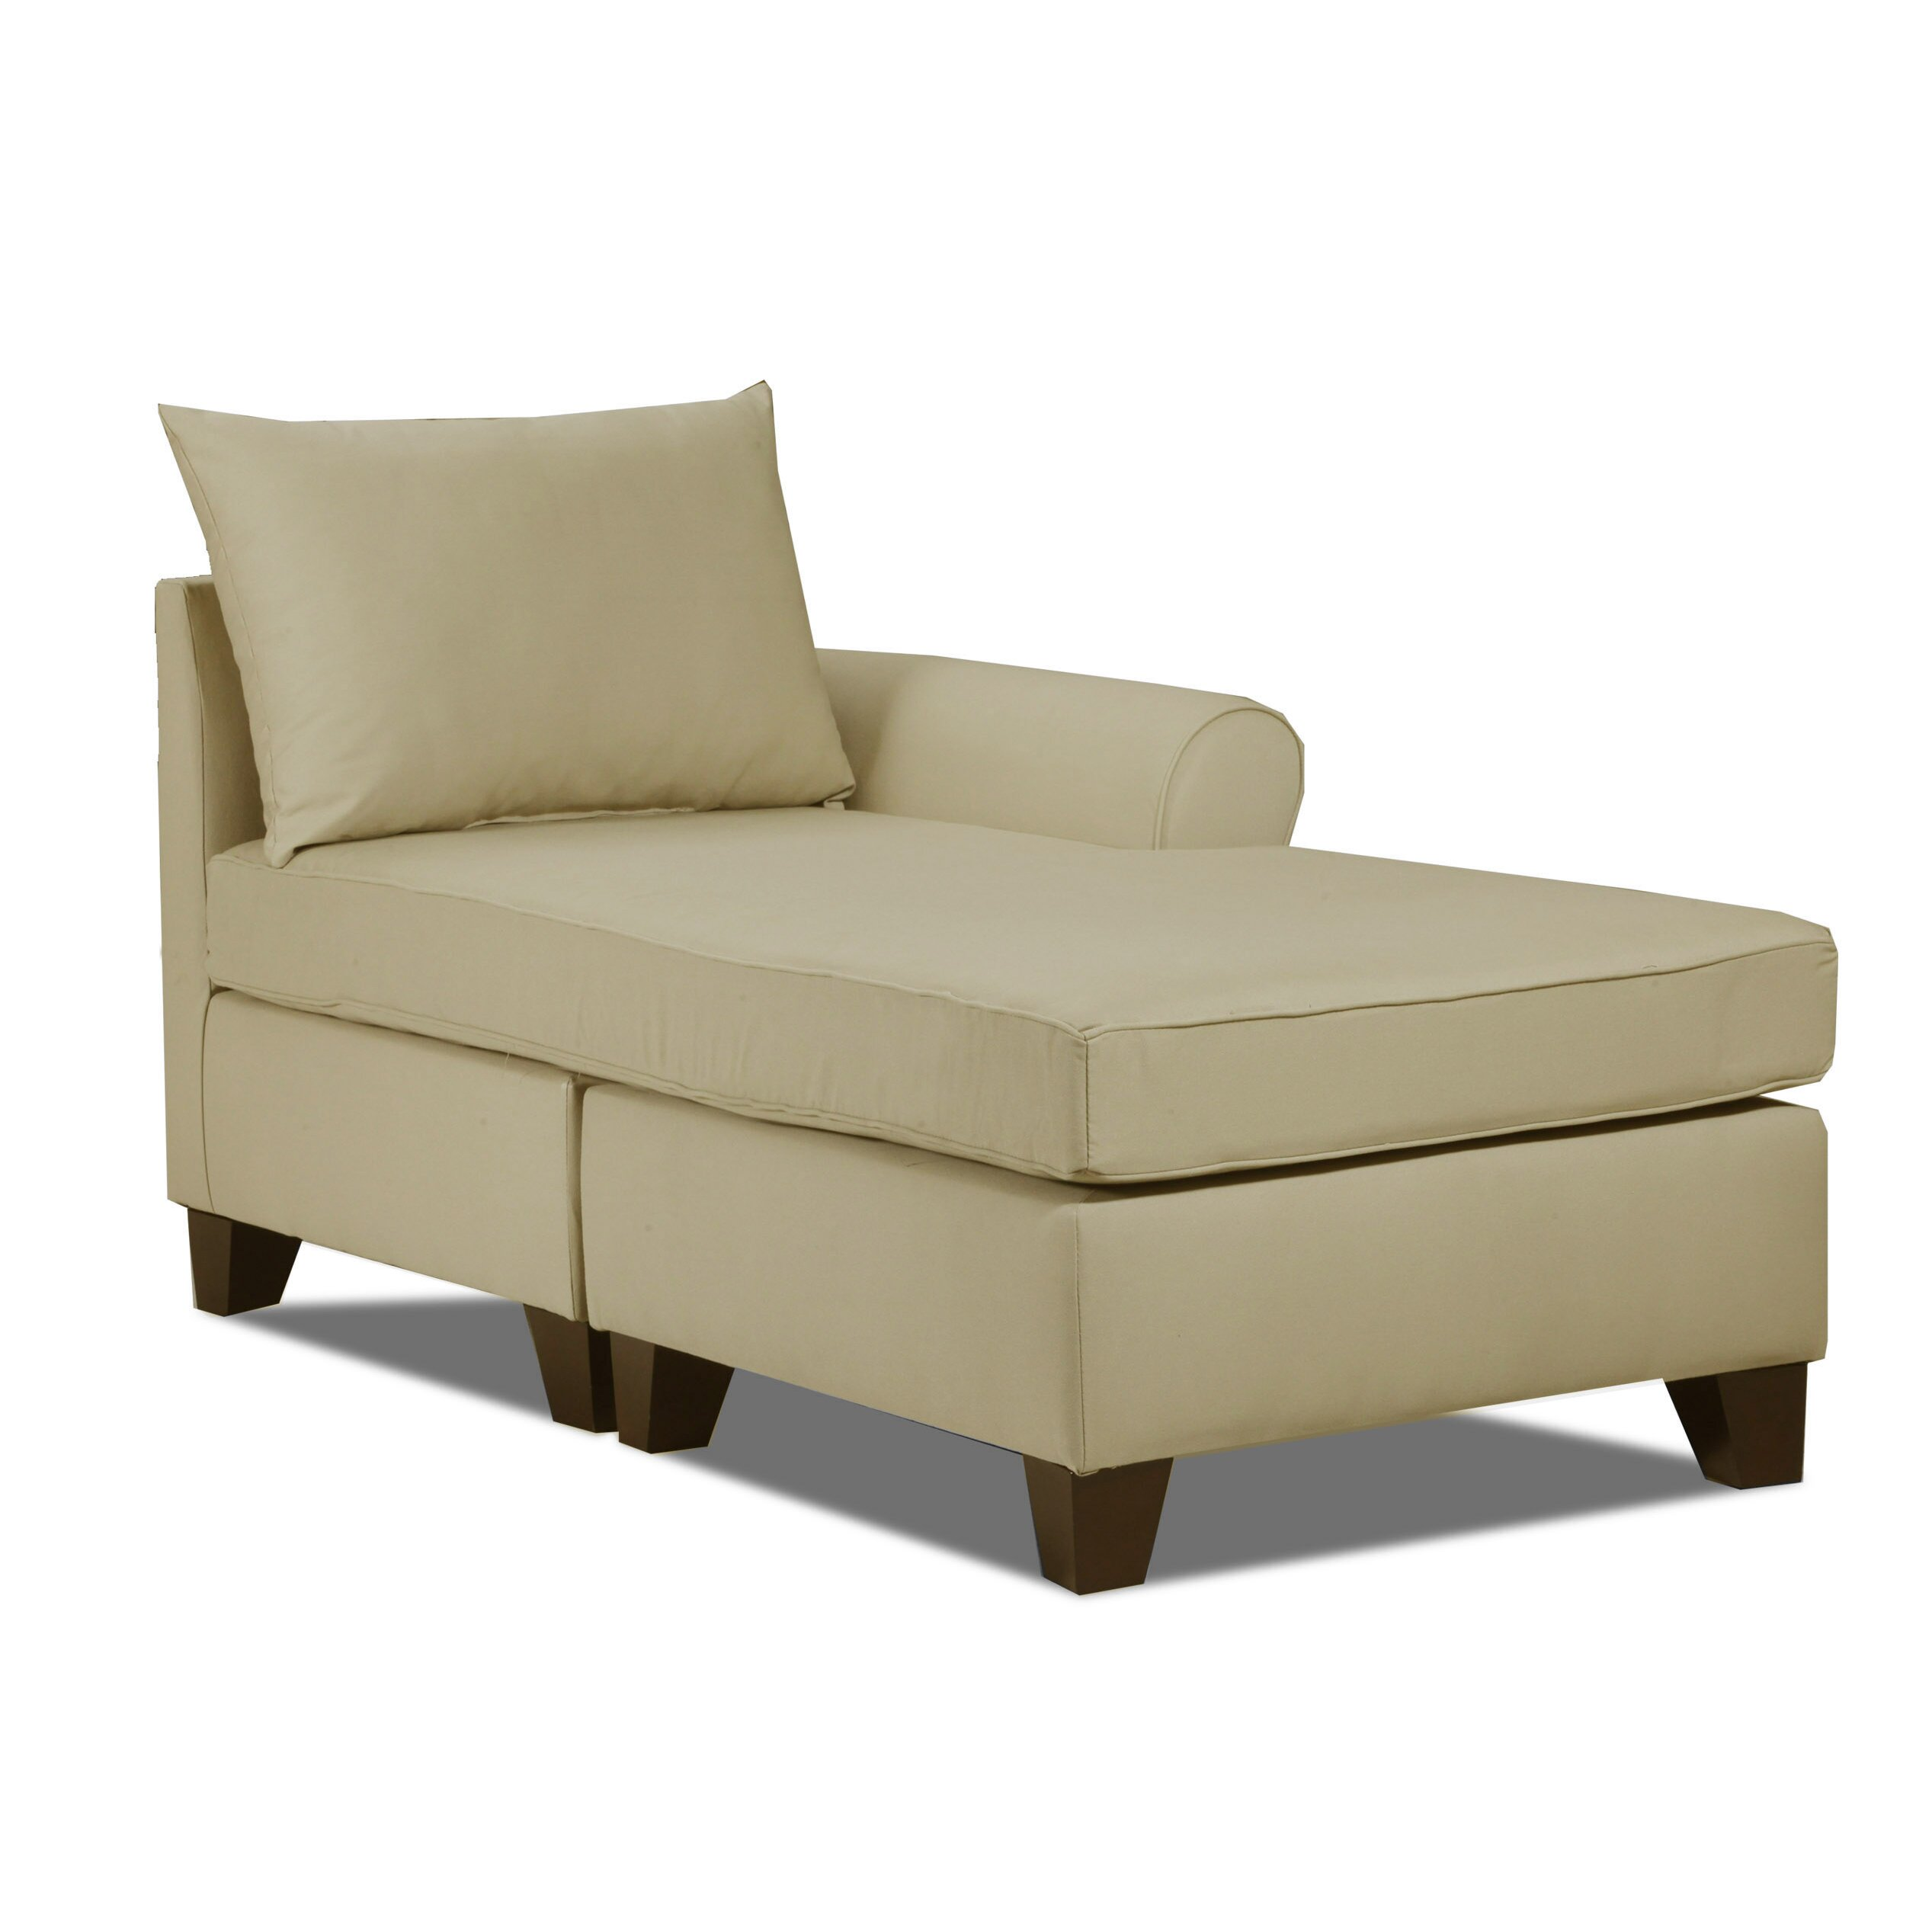 modern chaise lounges | allmodern